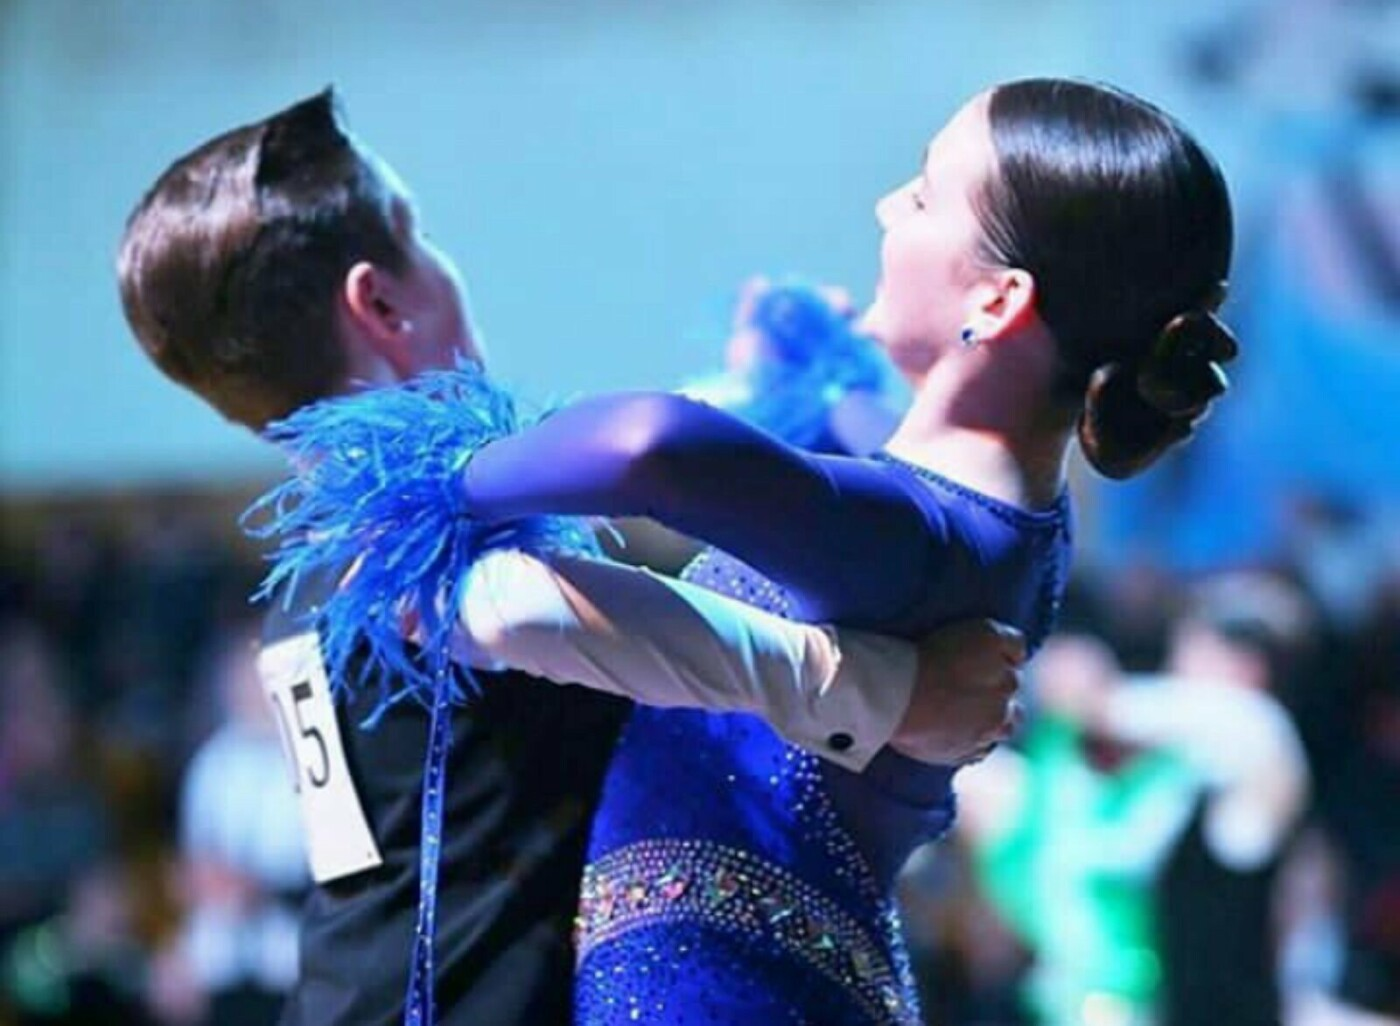 Танцы в Лозовой от А до Я: куда, когда и как?, фото-44